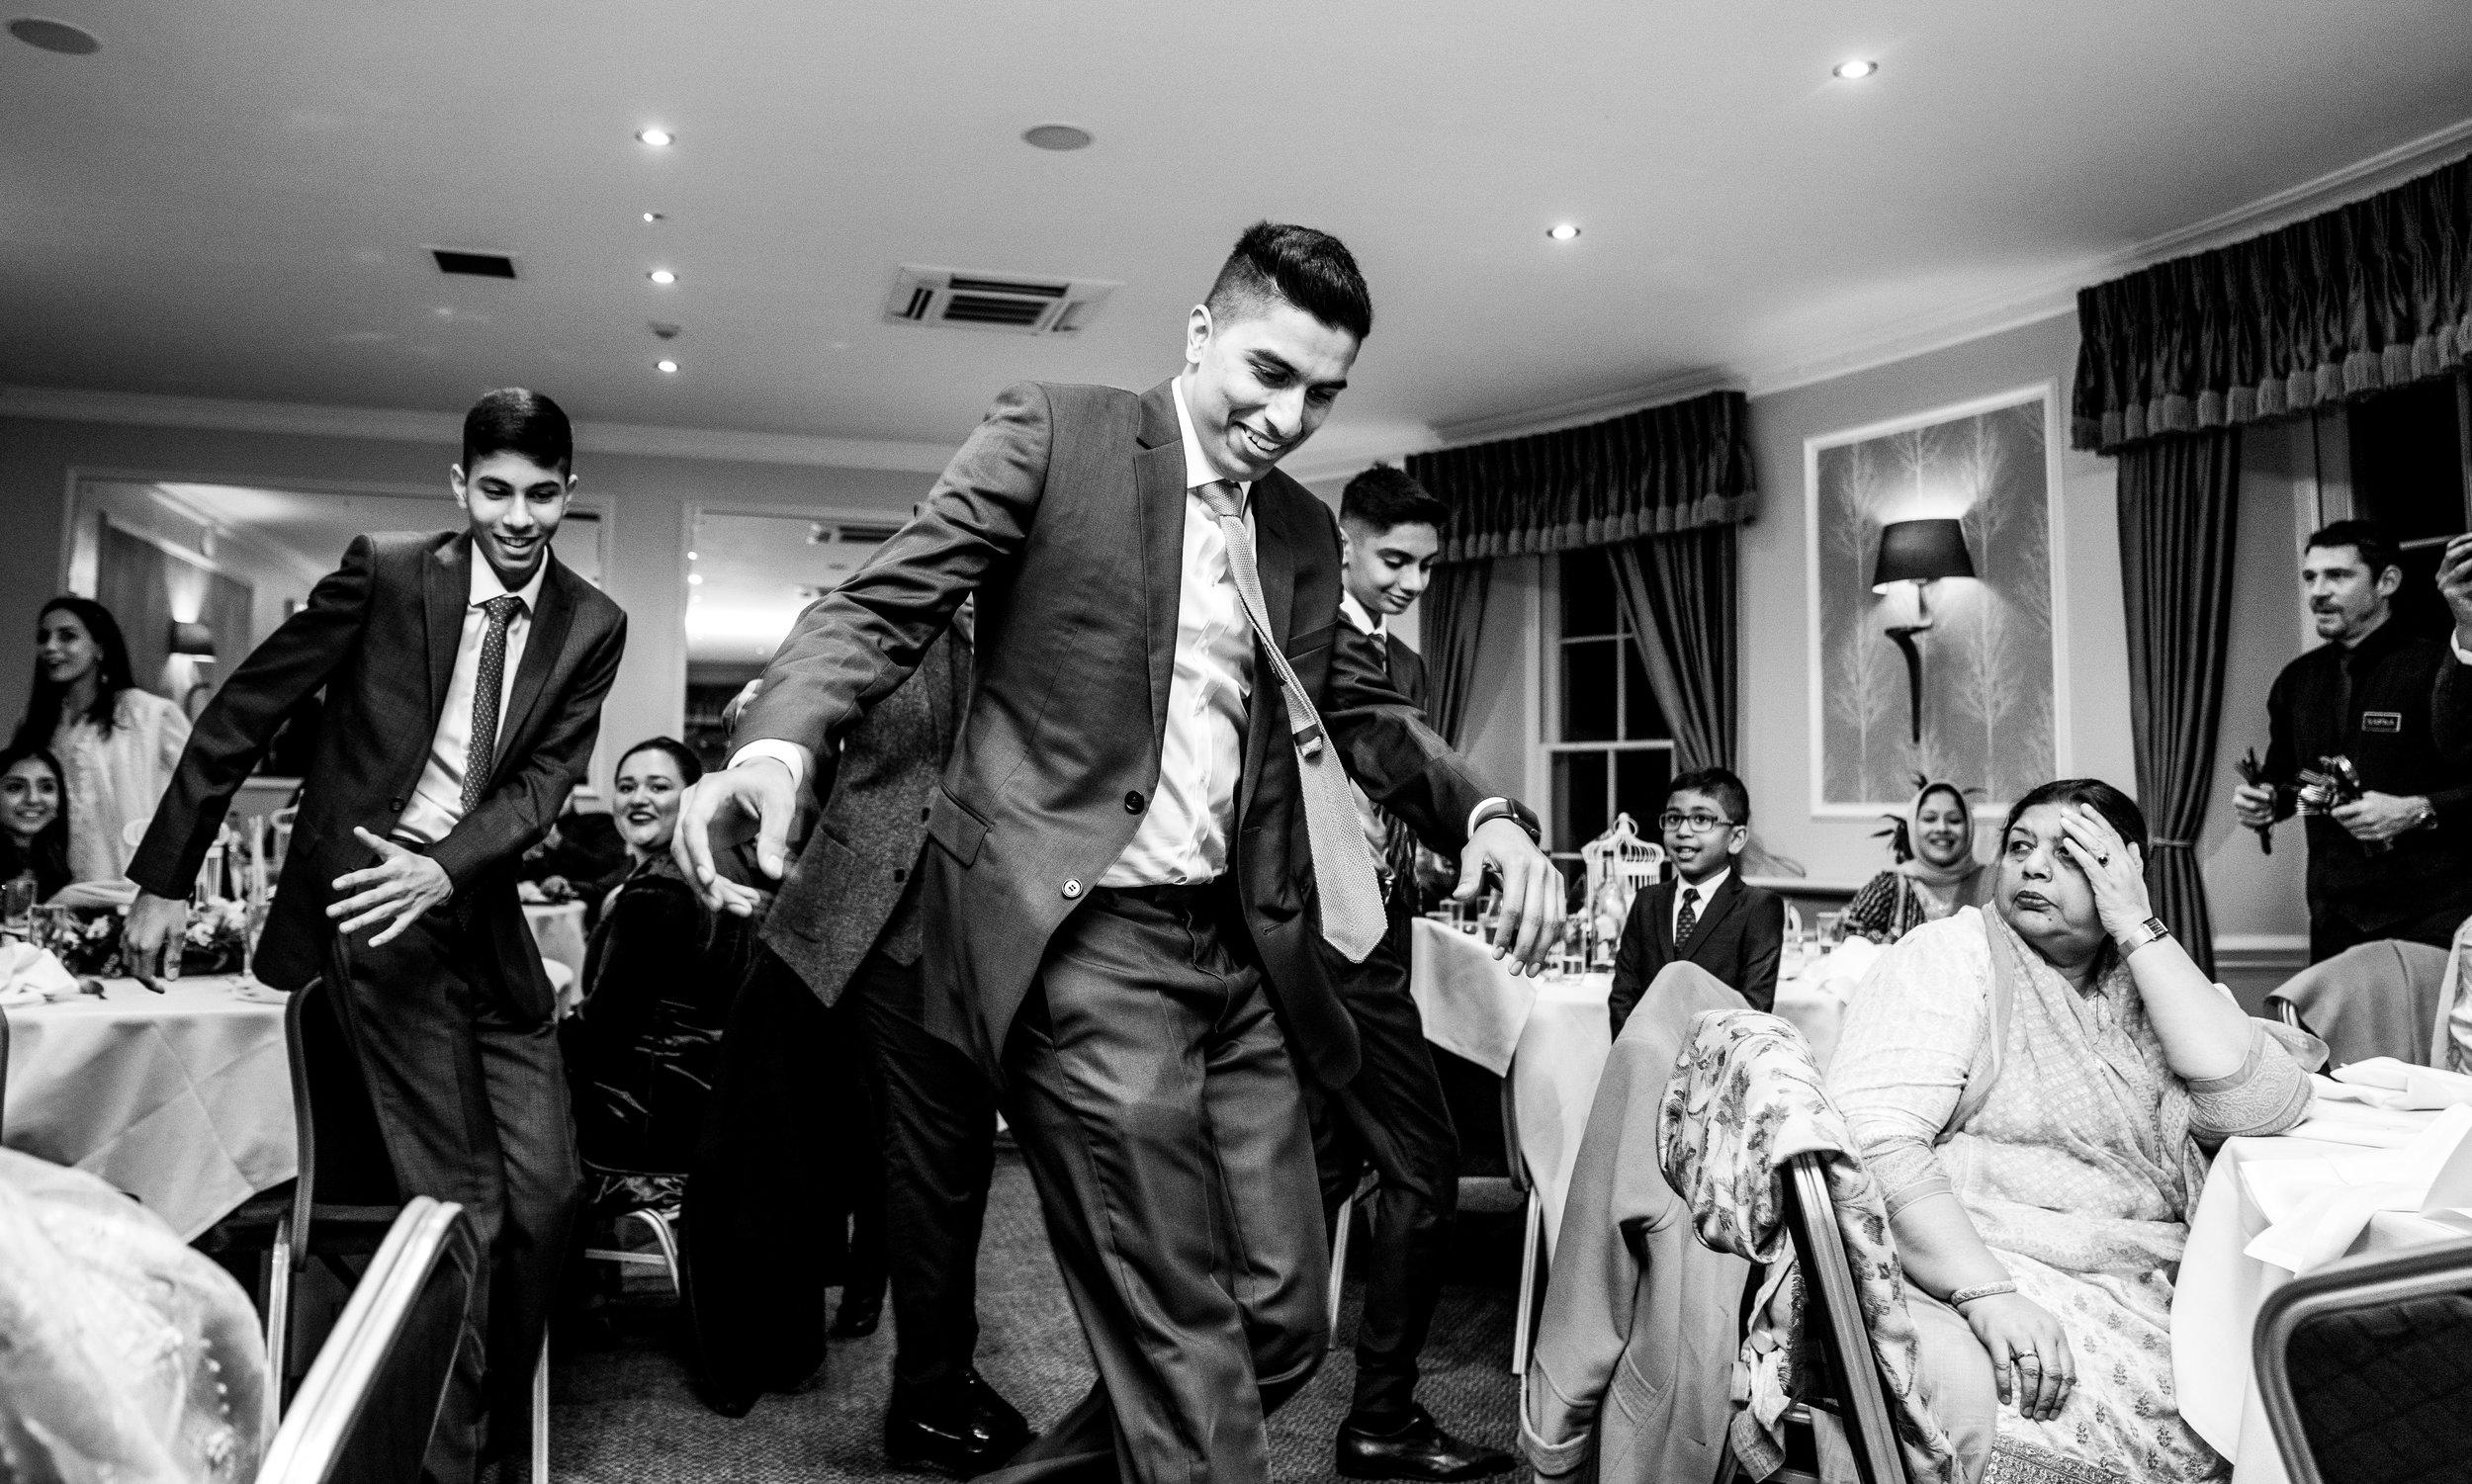 buckinghamshire-golf-club-winter-muslim-wedding-engagement-photography-videography-40